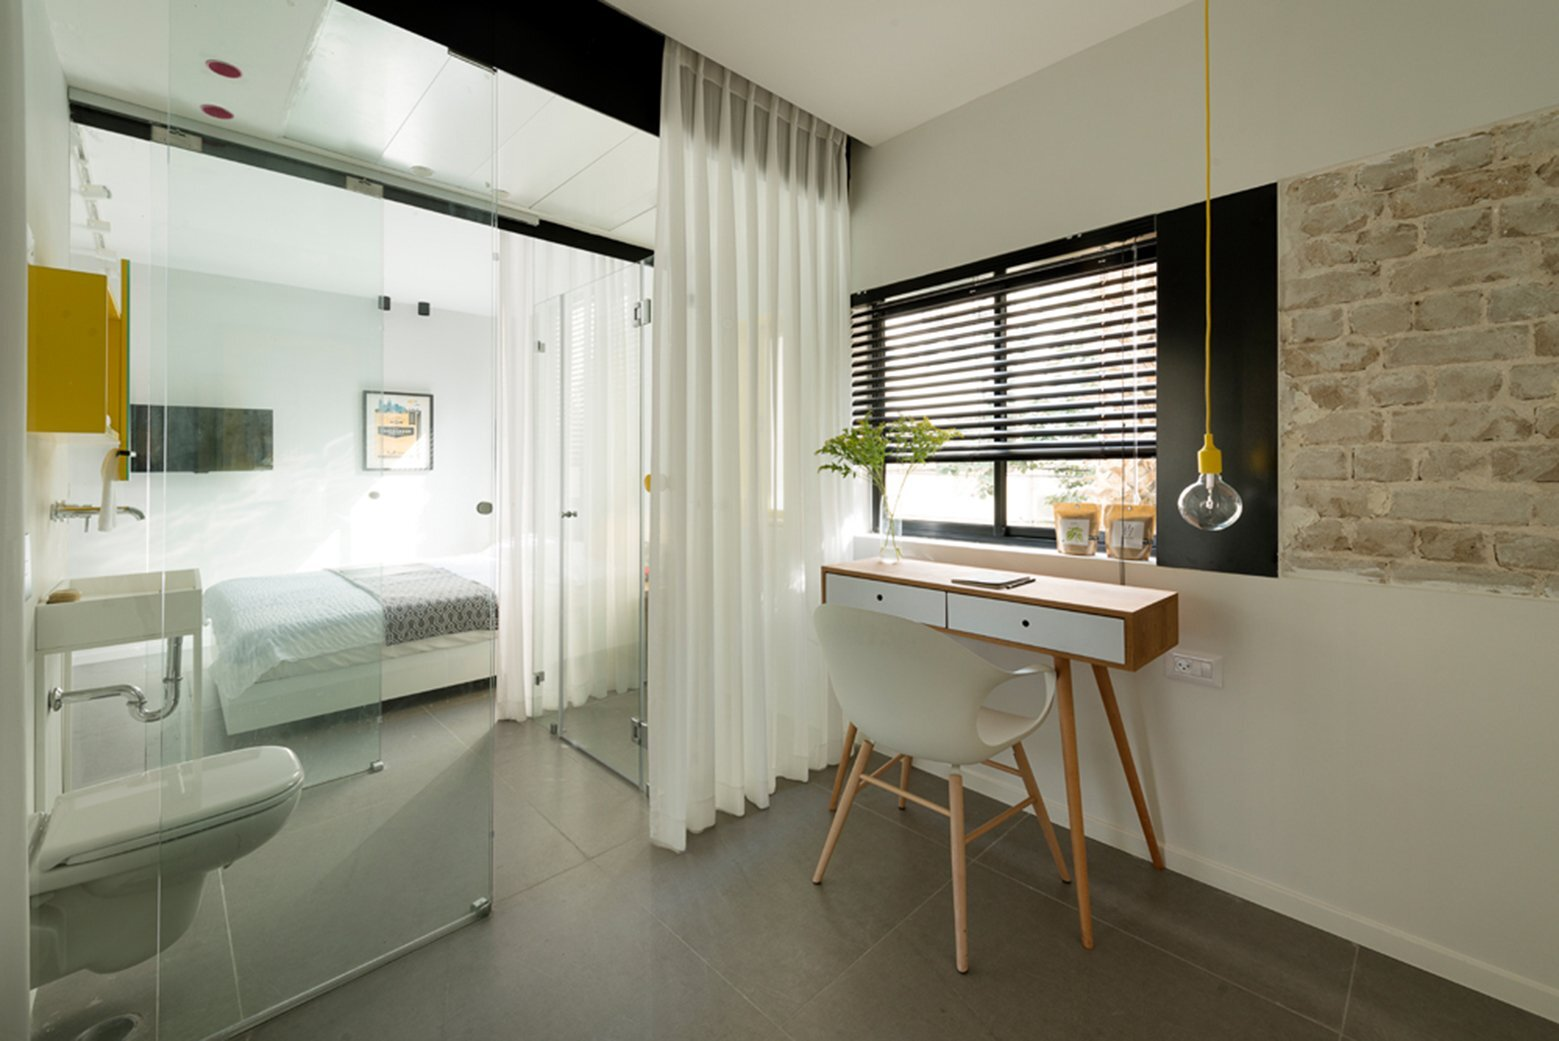 Gallery Of Cheap Apartments Tel Aviv Idea In Tel Aviv Small Apartment Maayan Zusman Interior Design Tel Aviv